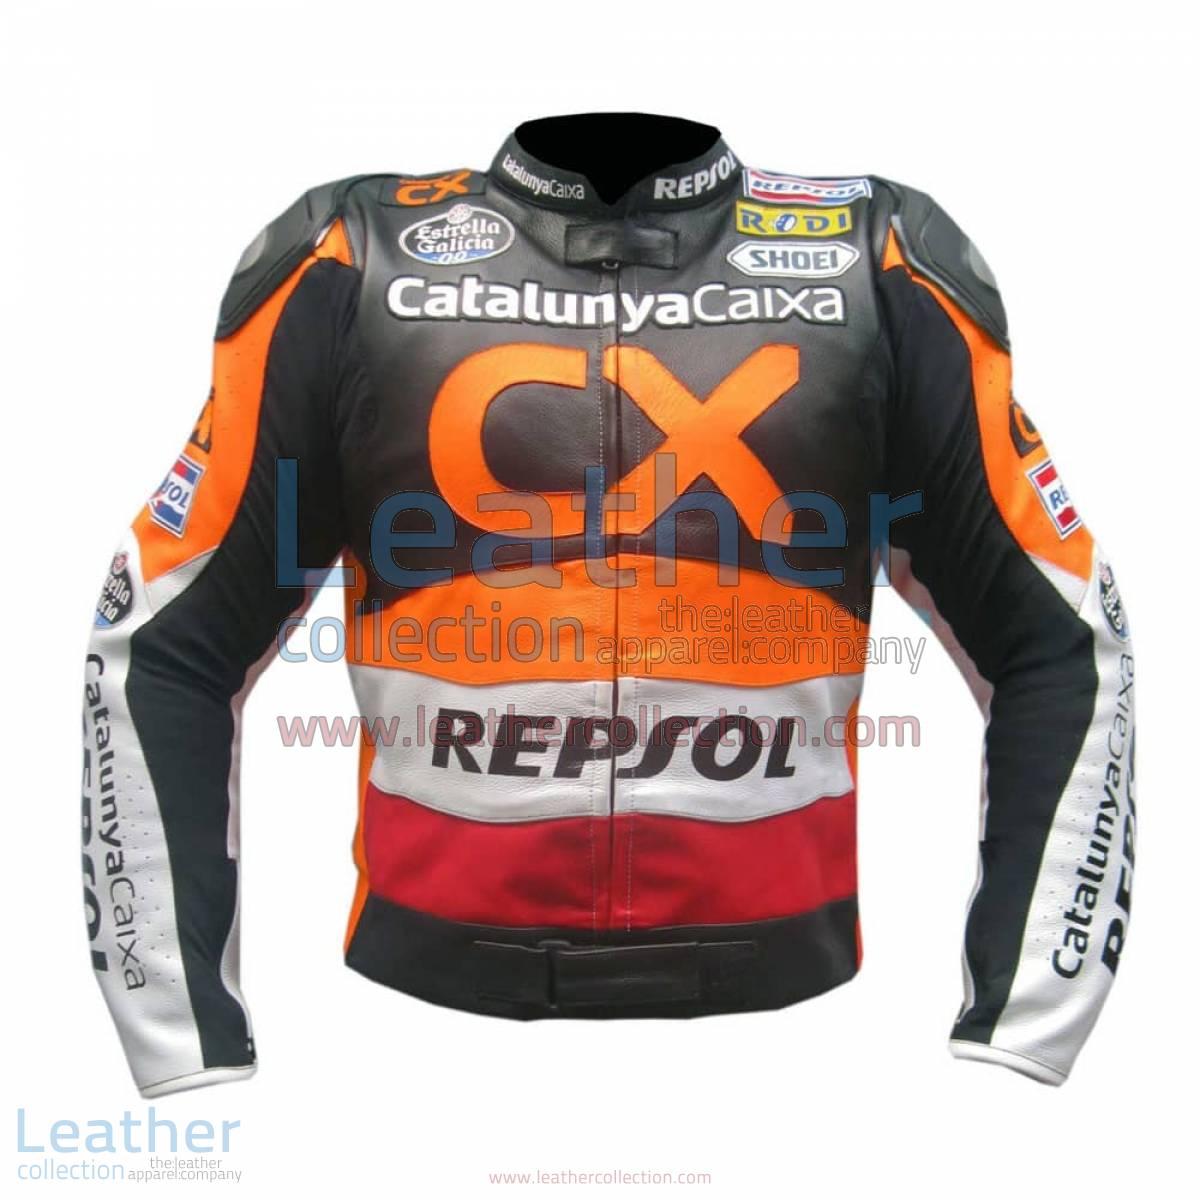 Repsol CX Leather Race Jacket